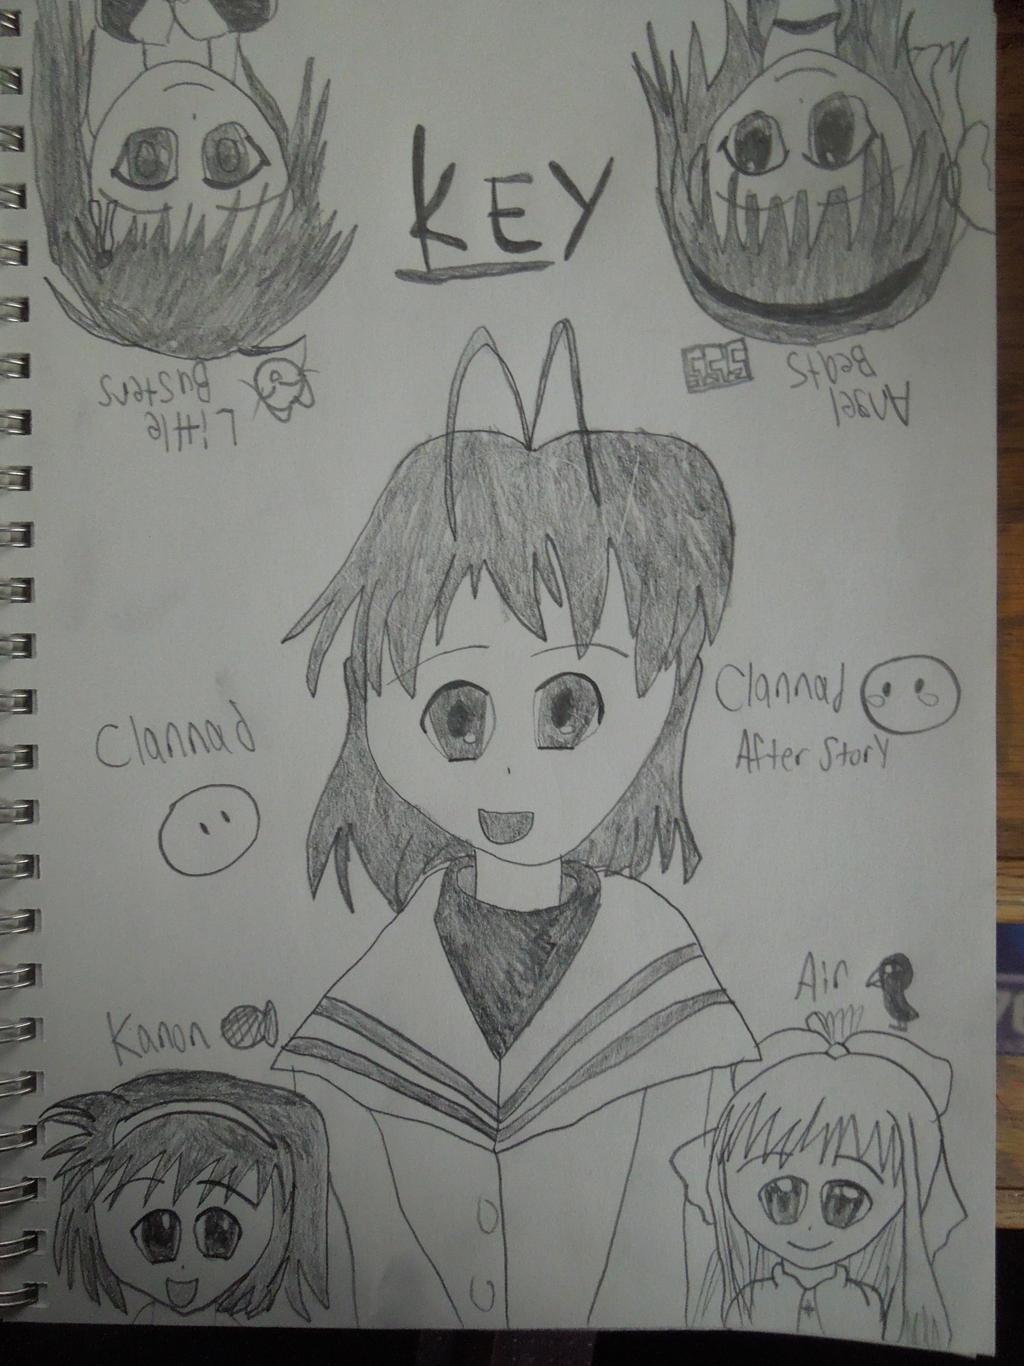 Key by MidniteAndBeyond